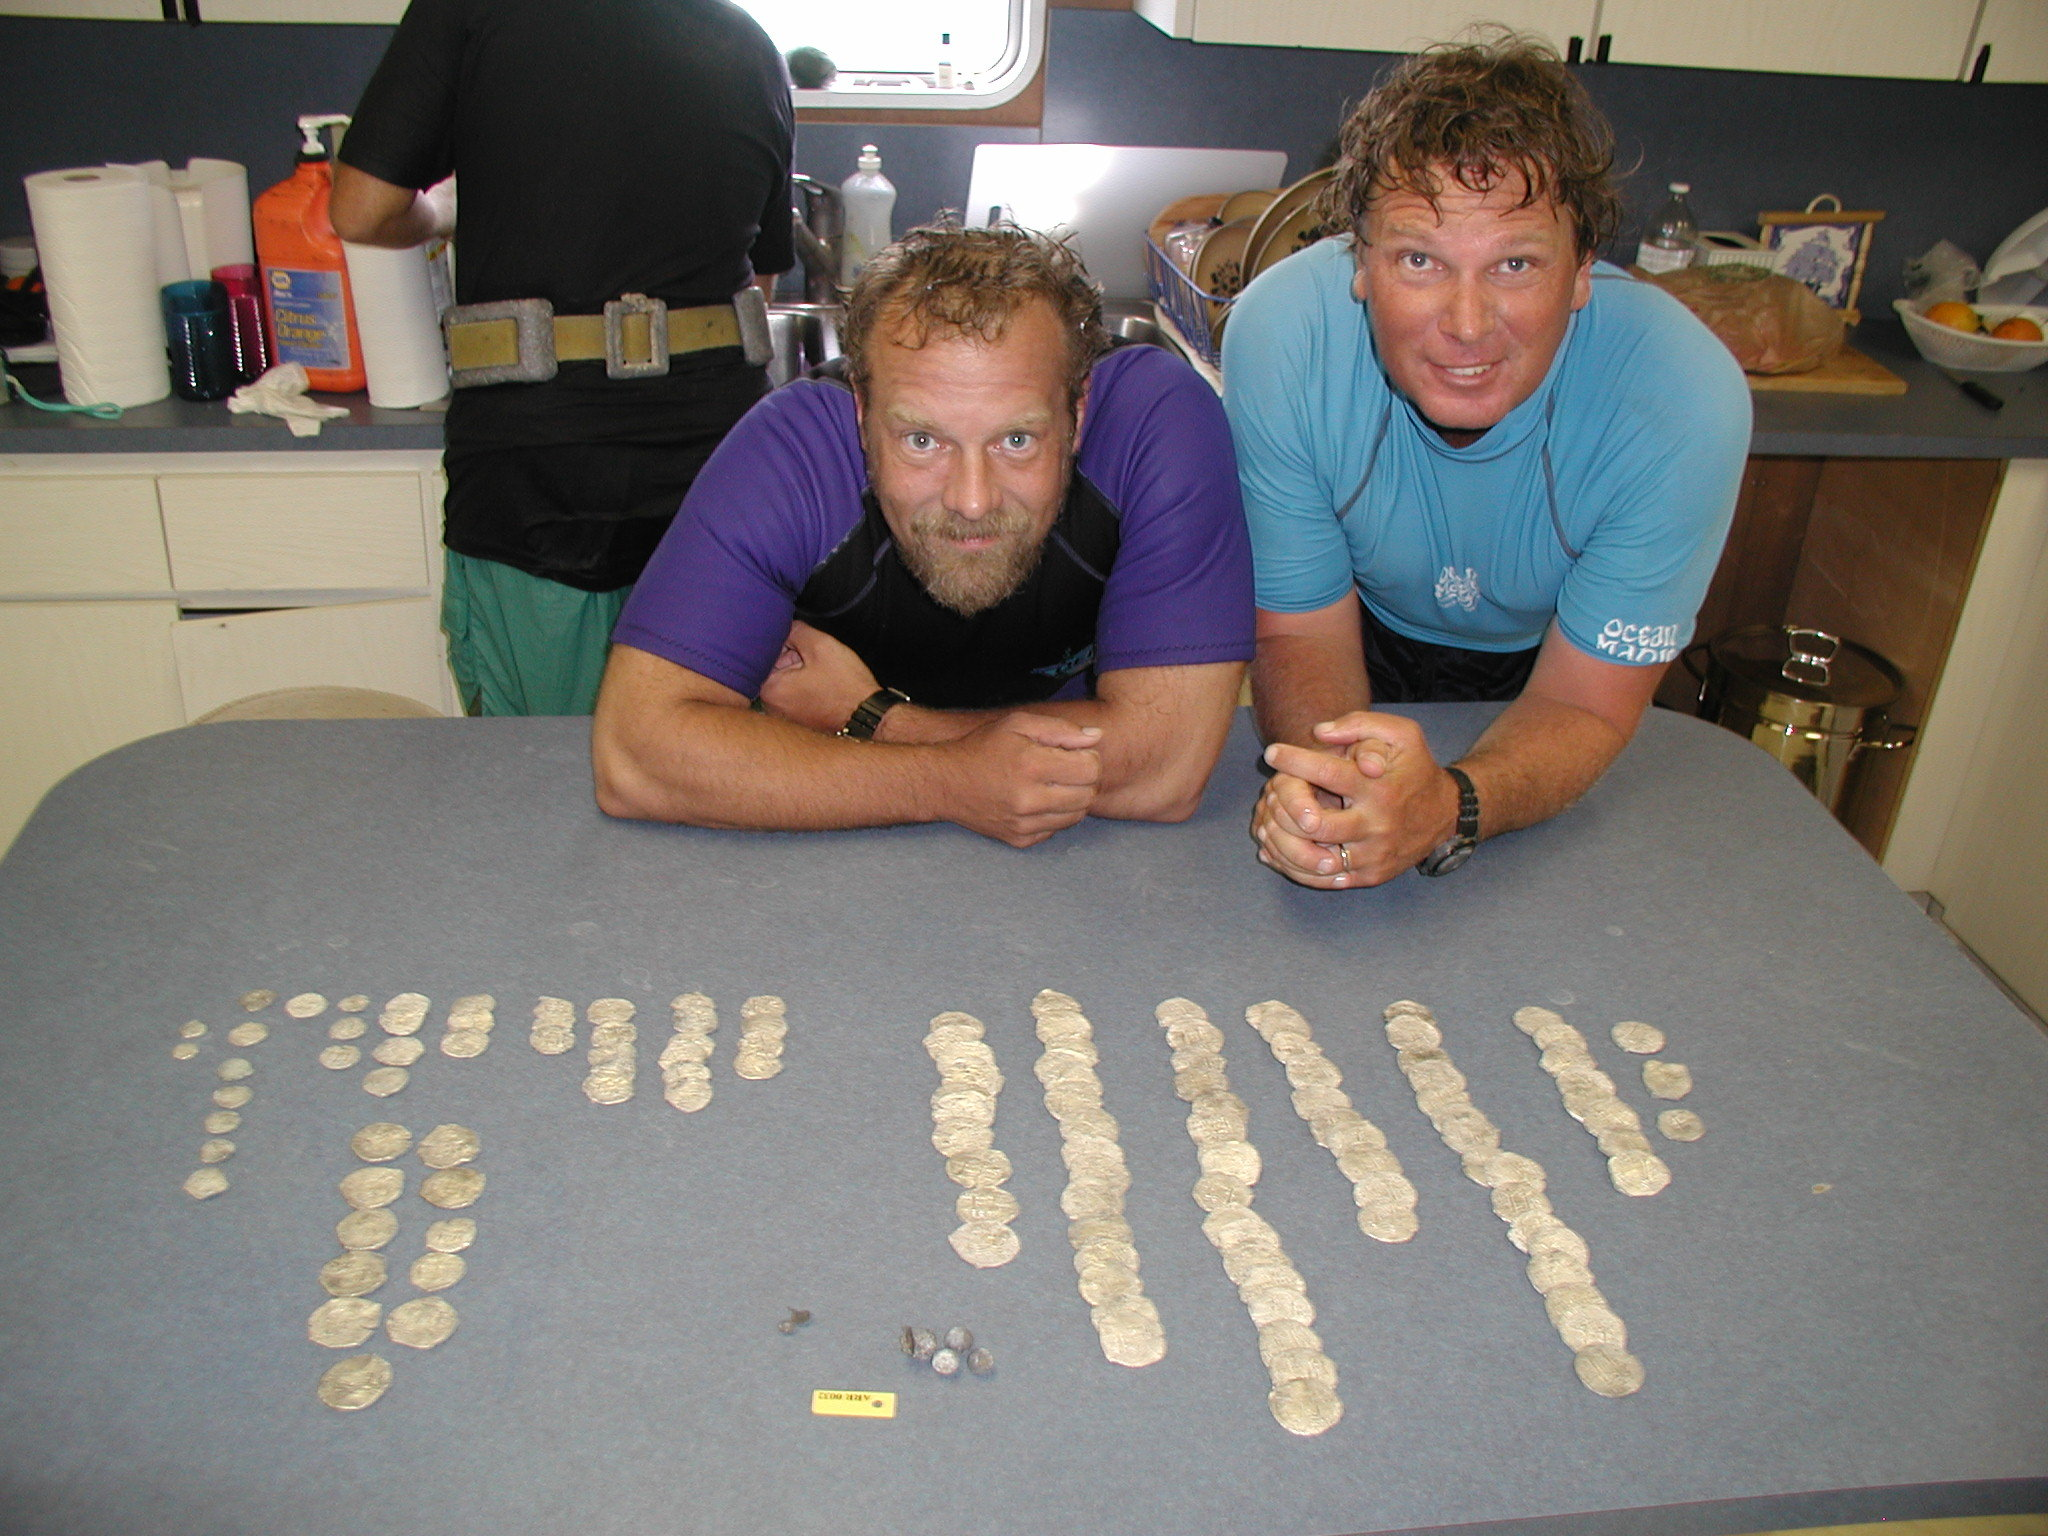 Jim Sinclair, Pete and coins high view.jpg